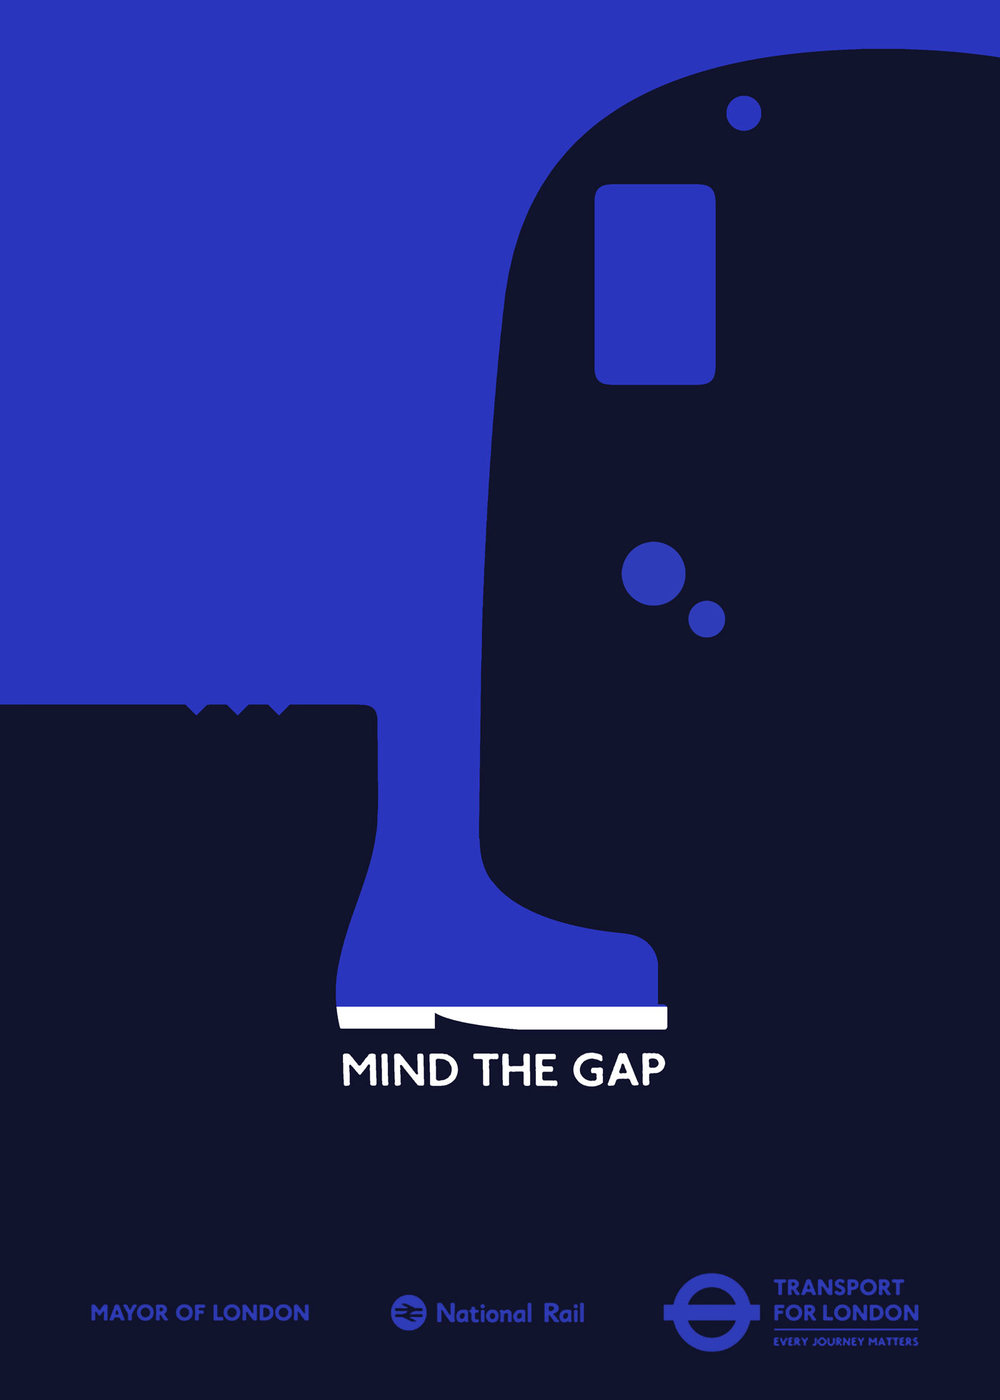 Transport for London - Saatchi & Saatchi commissioned some alternative poster designs for TfL's